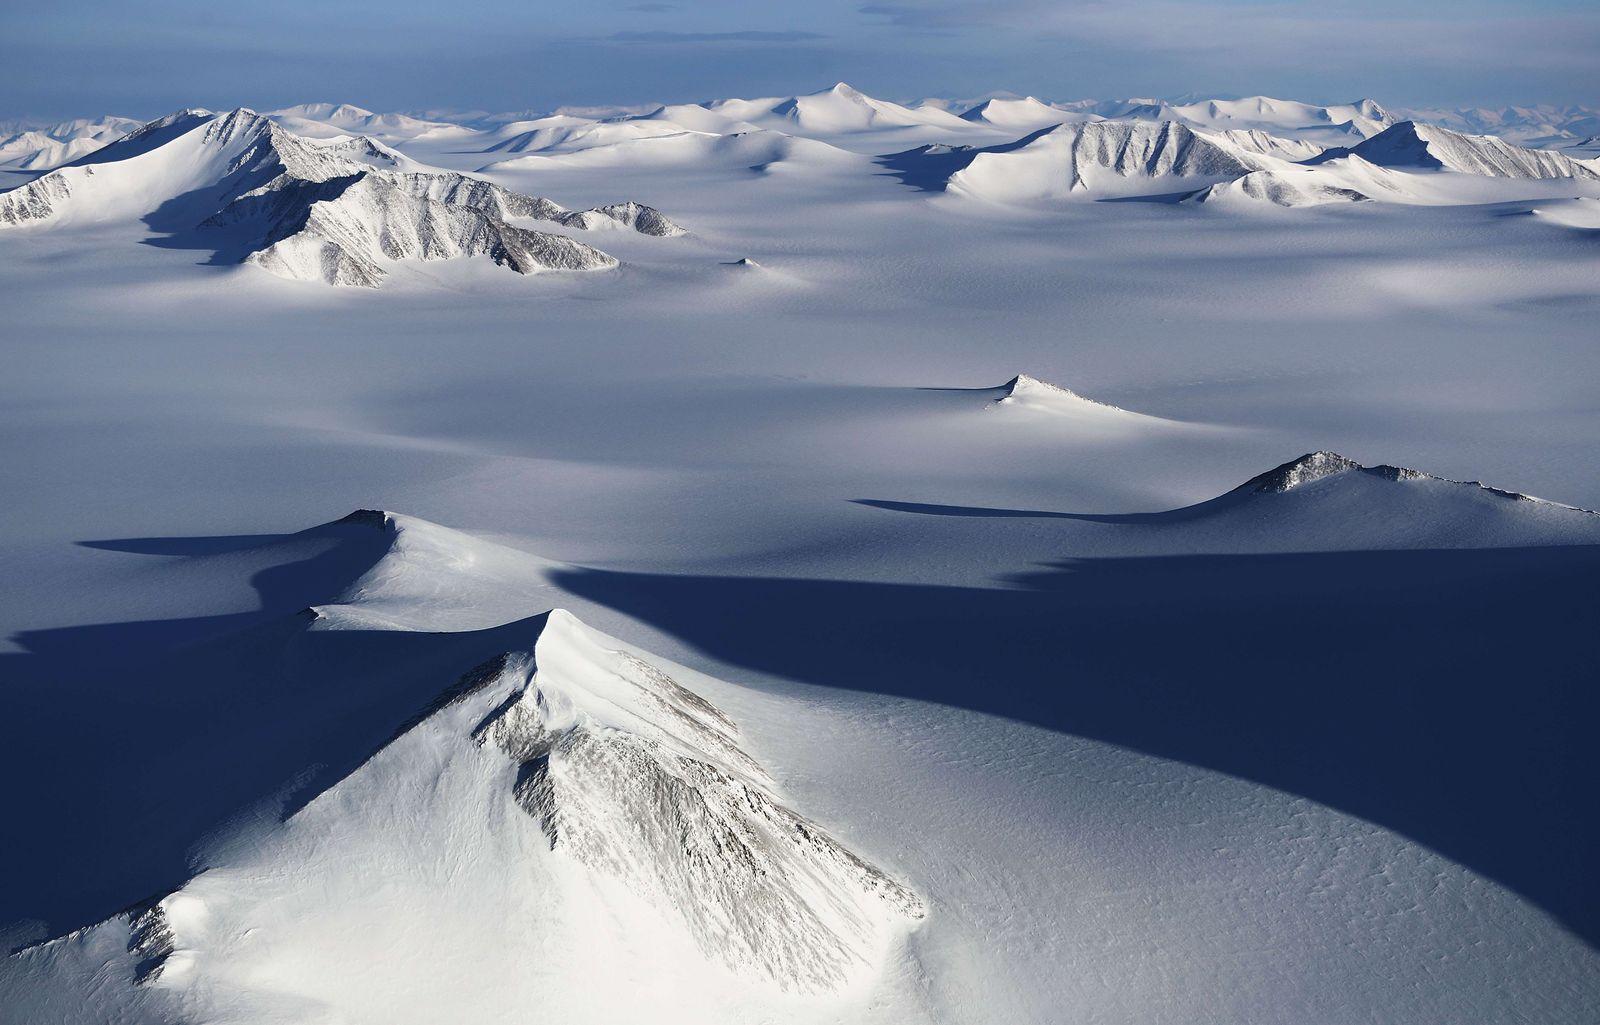 NASA / IceBride / Arktis / Kanada